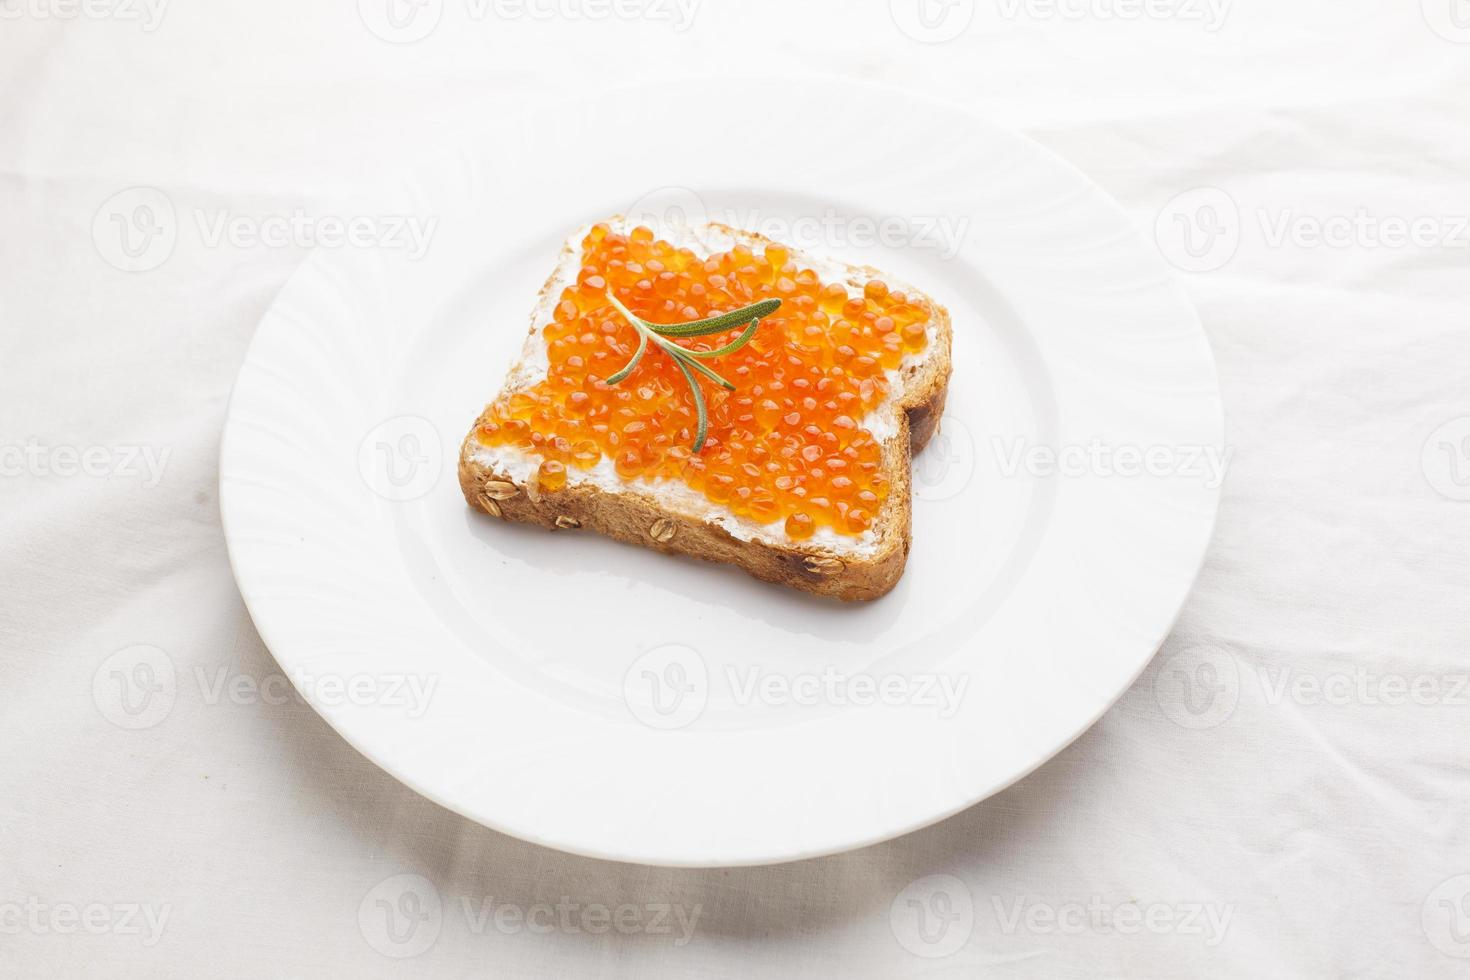 Luxurt Sandvich - Caviar and rosemary on bread photo